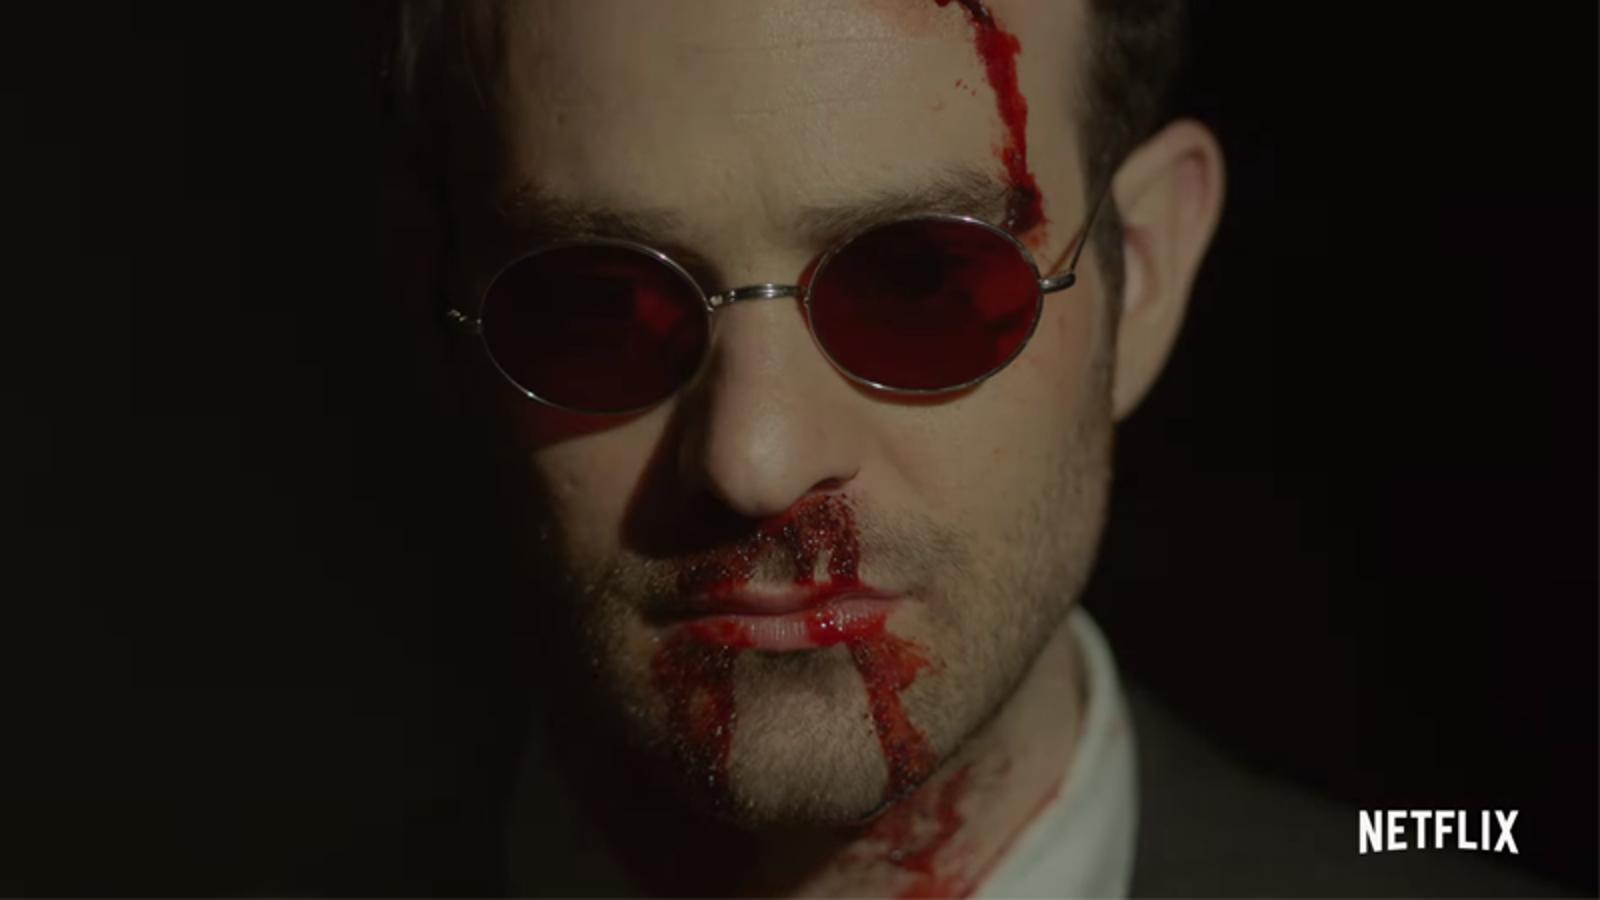 A Vengeful DaredevilReturns for Season 3 This October